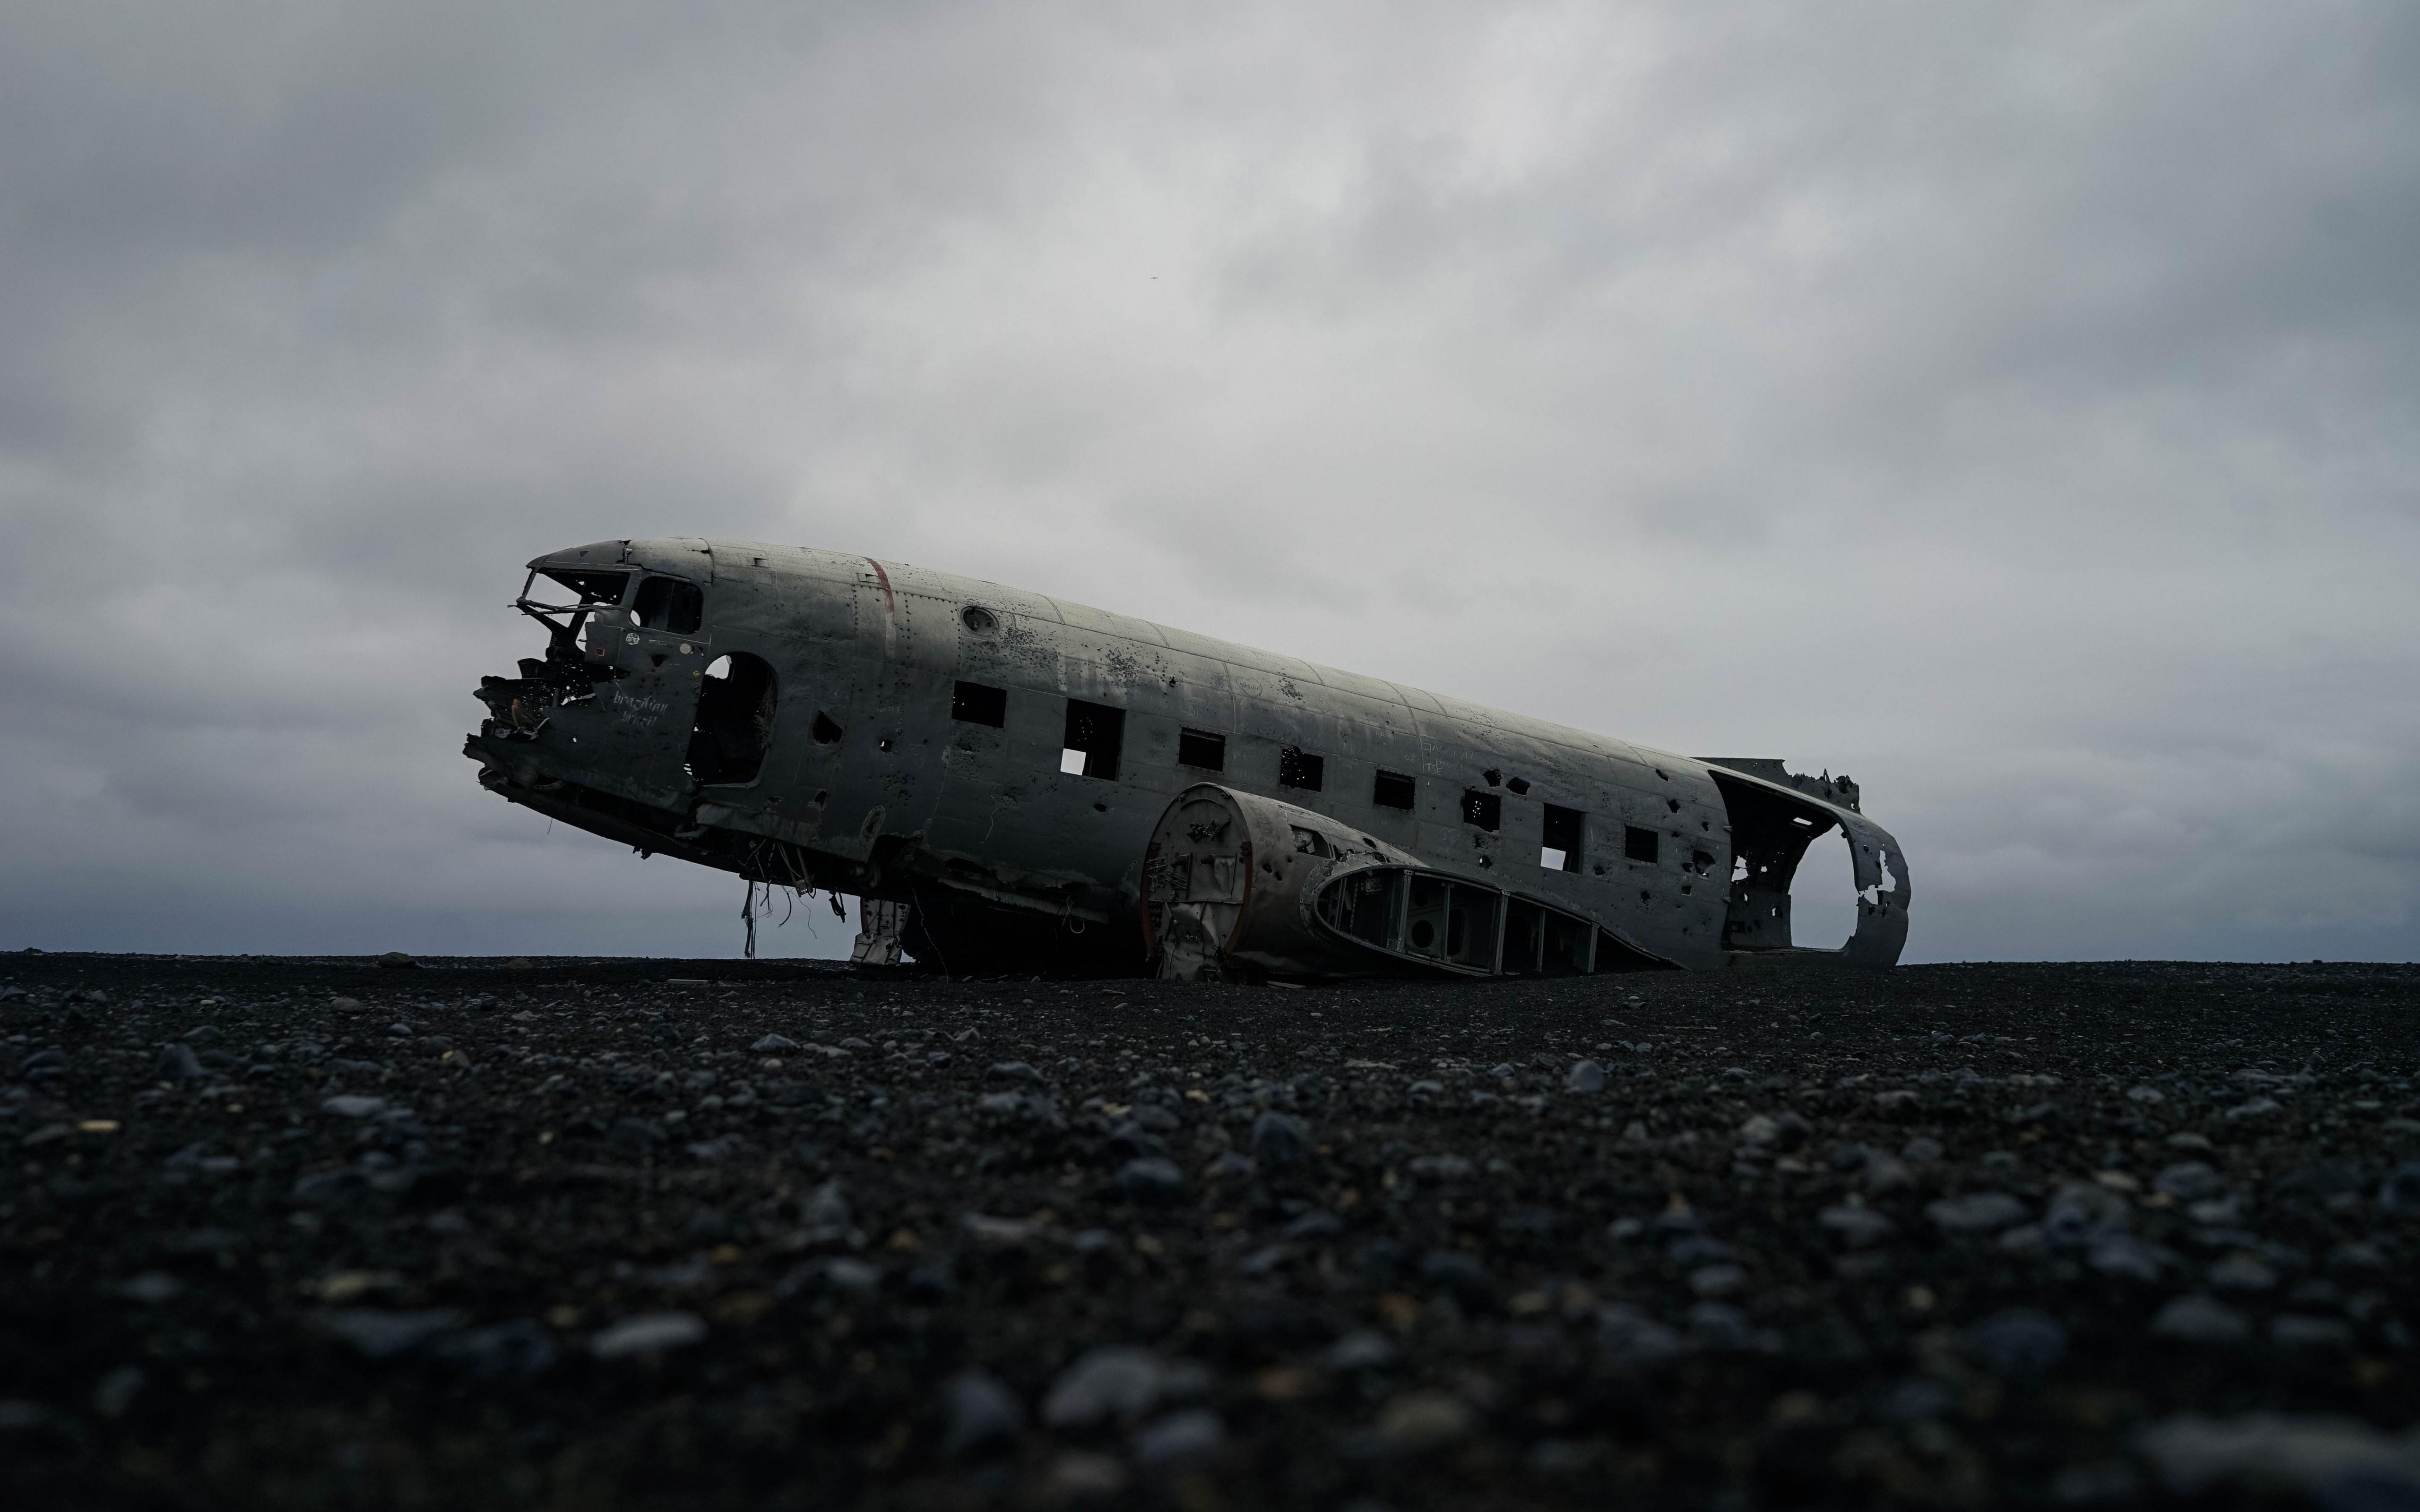 Solheimasandur Plane Wreck Iceland Wallpaper